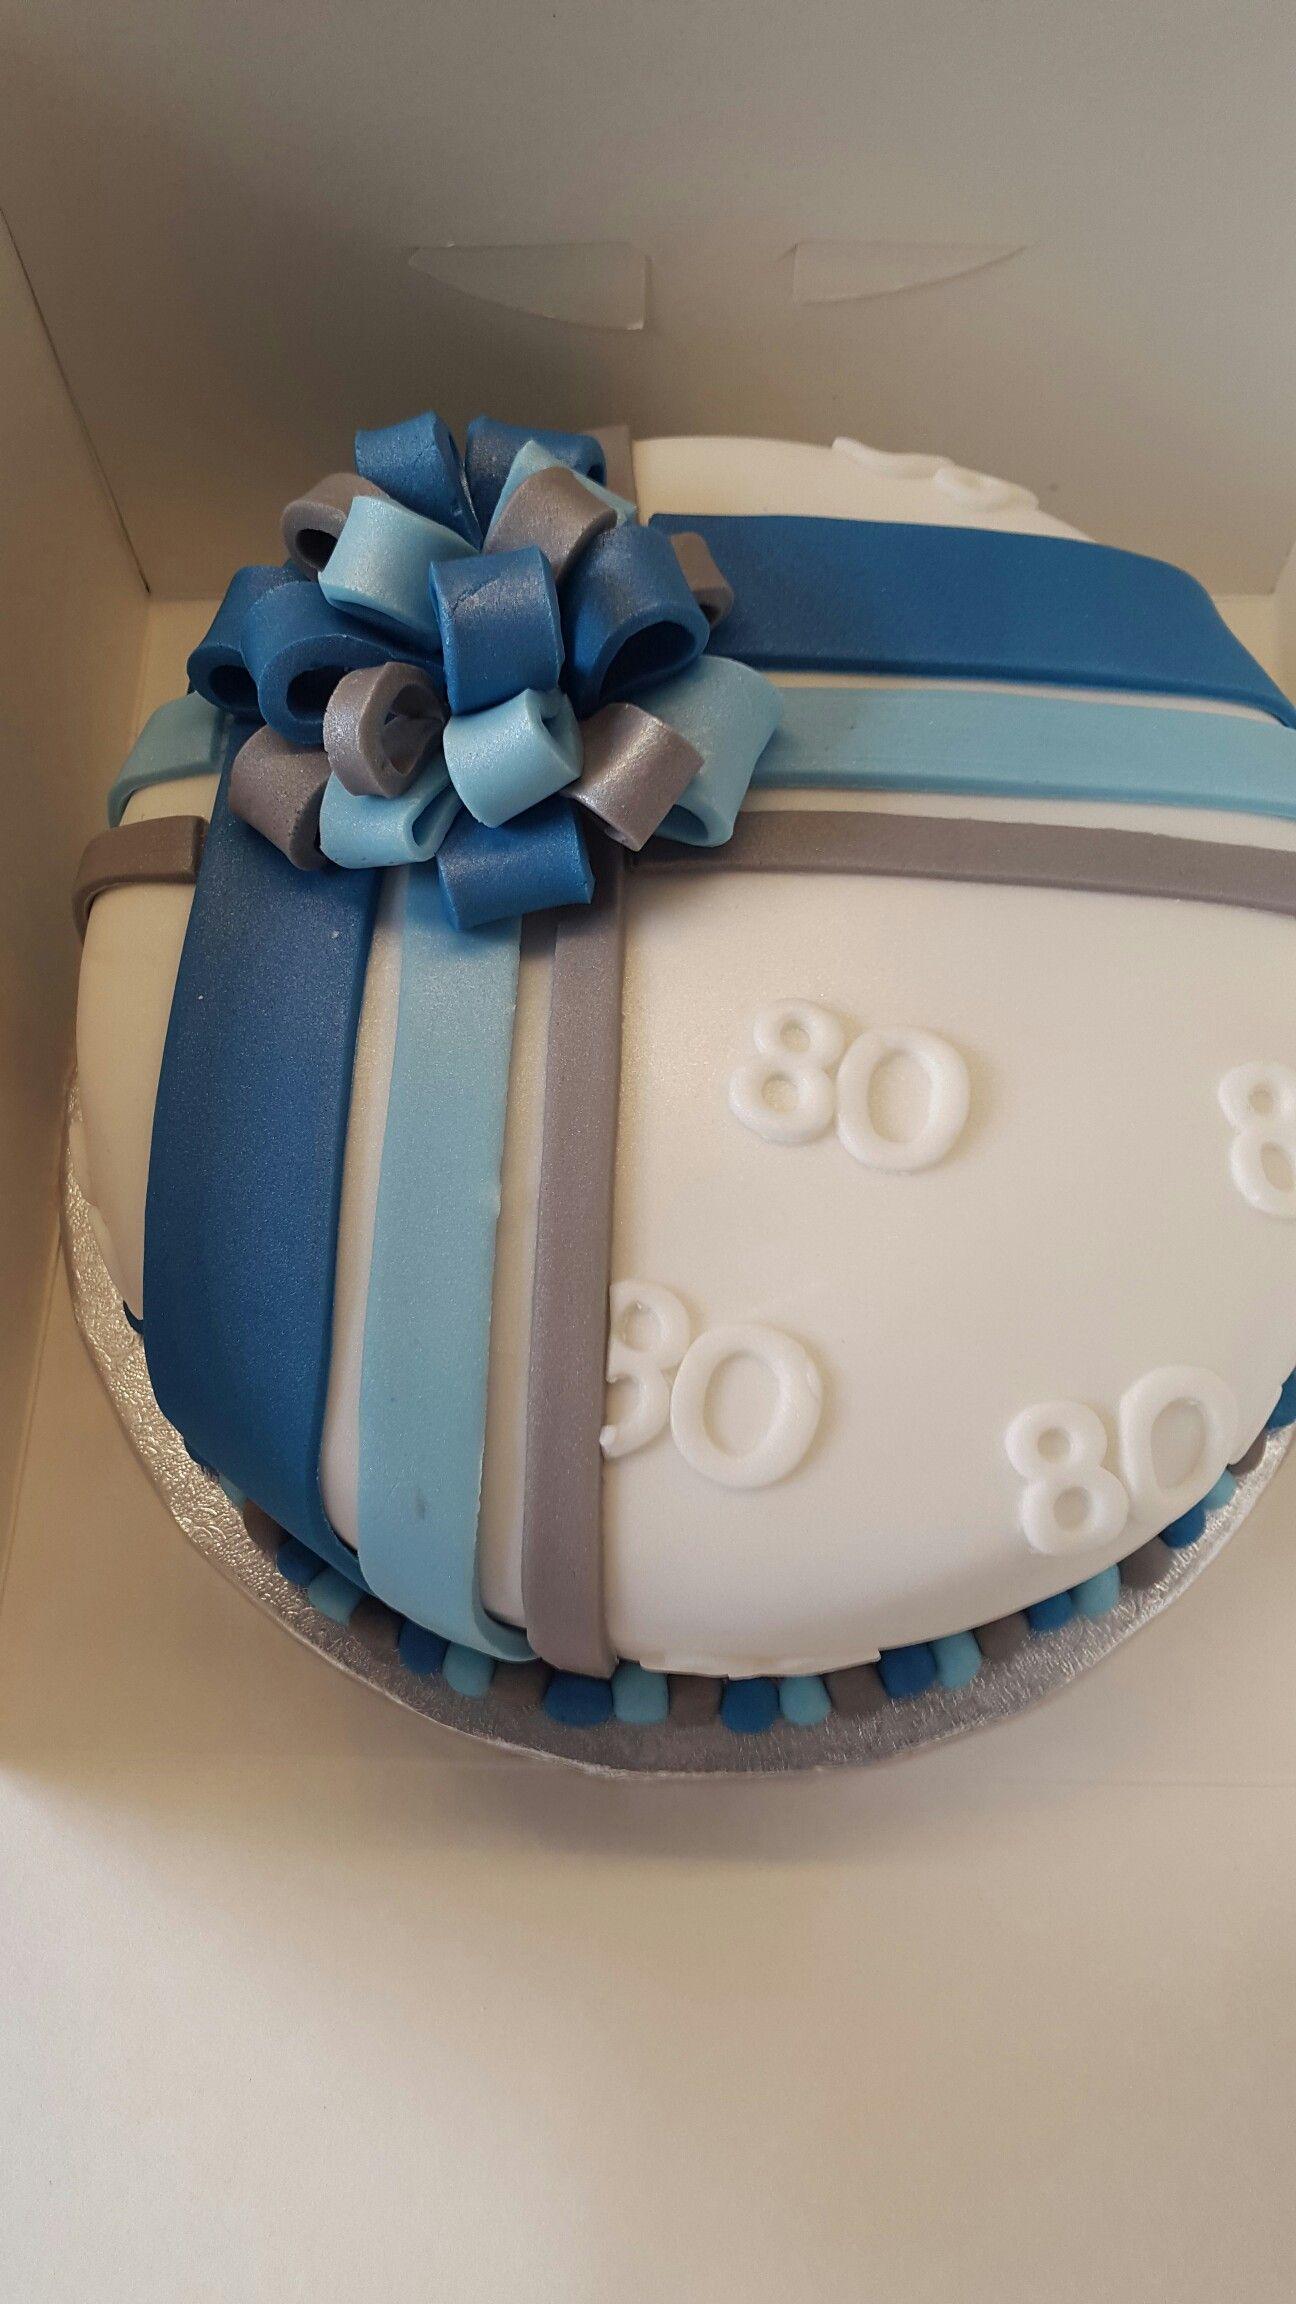 Easy Birthday Cake Decorating Ideas For Men